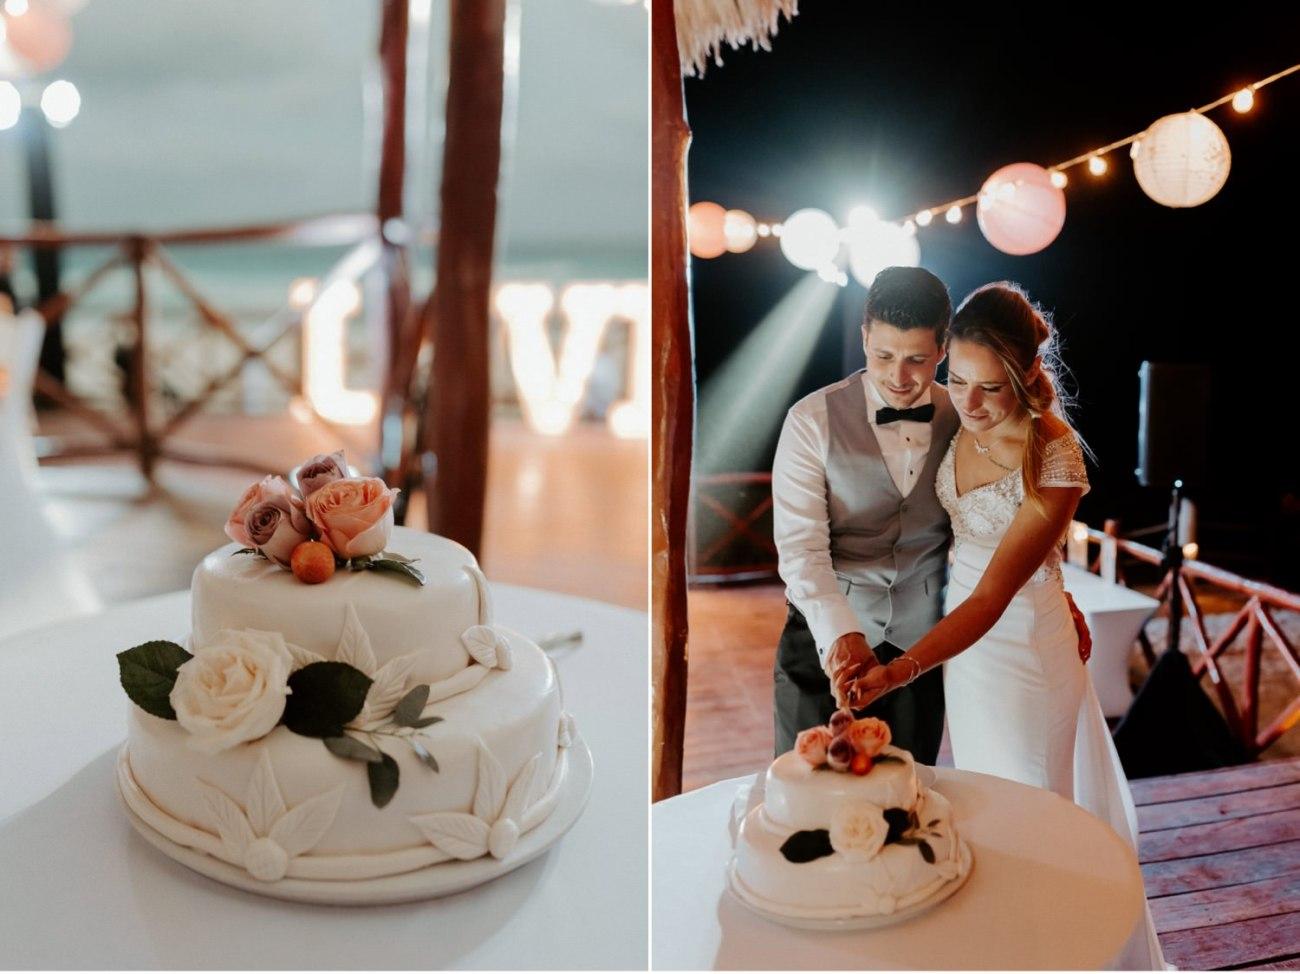 Cancun Destination Wedding Mexico Tulum Wedding Photographer Anais Possamai Photography 075